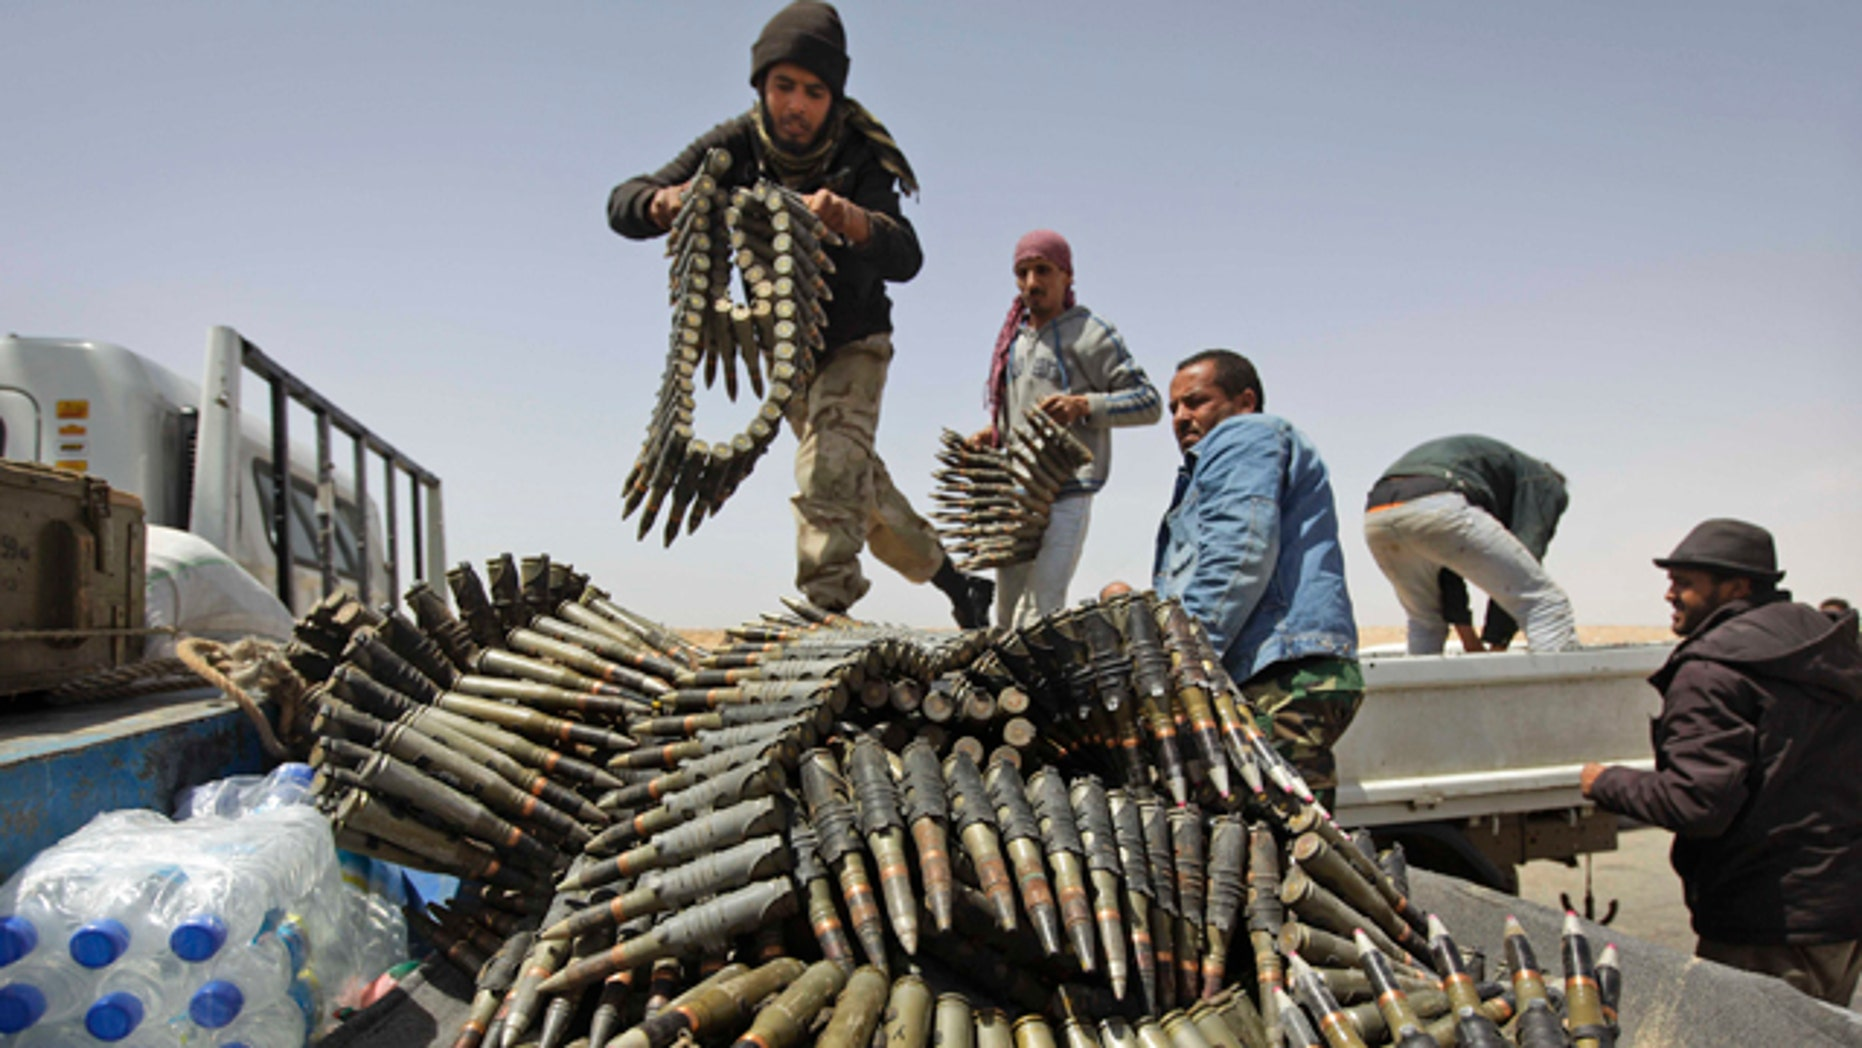 April 16, 2011: Libyan rebel fighters load a truck with ammunition on the outskirts of Ajdabiya, Libya